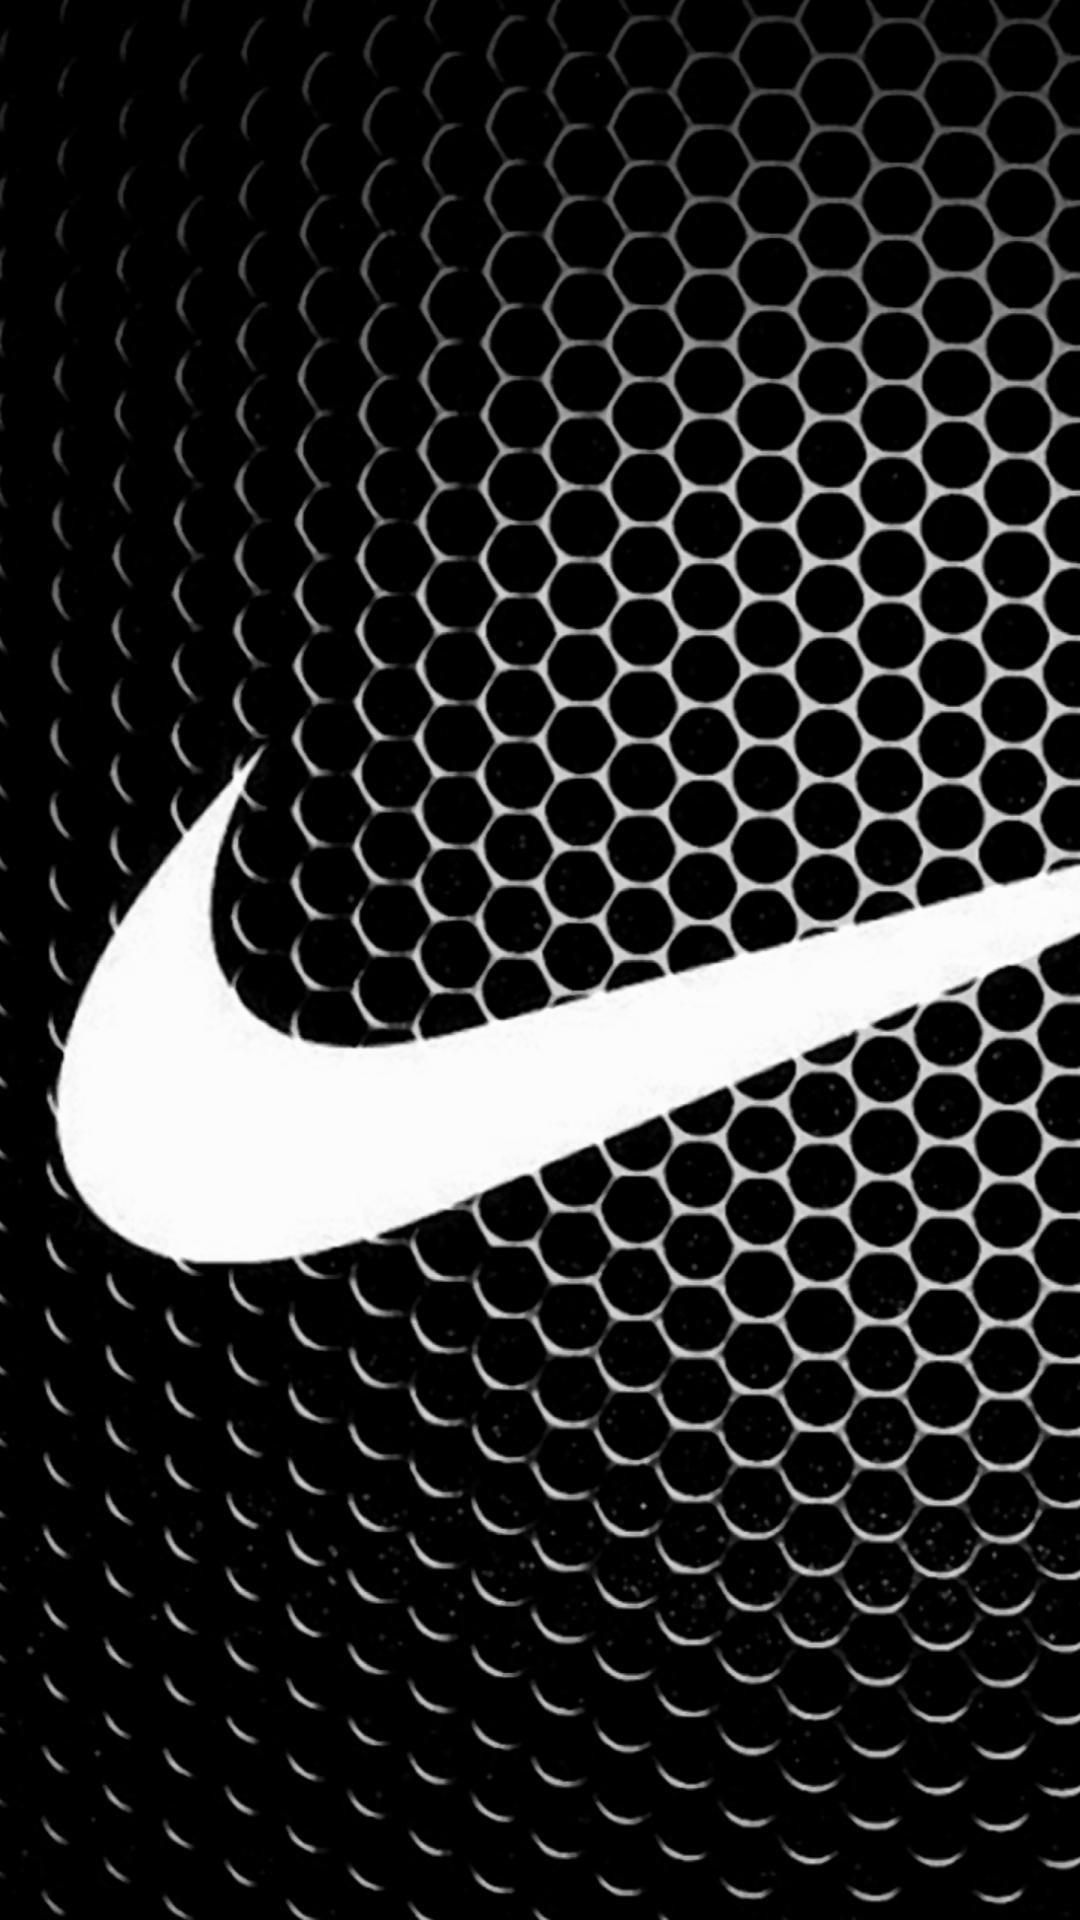 Nike Wallpapers Hd 2018